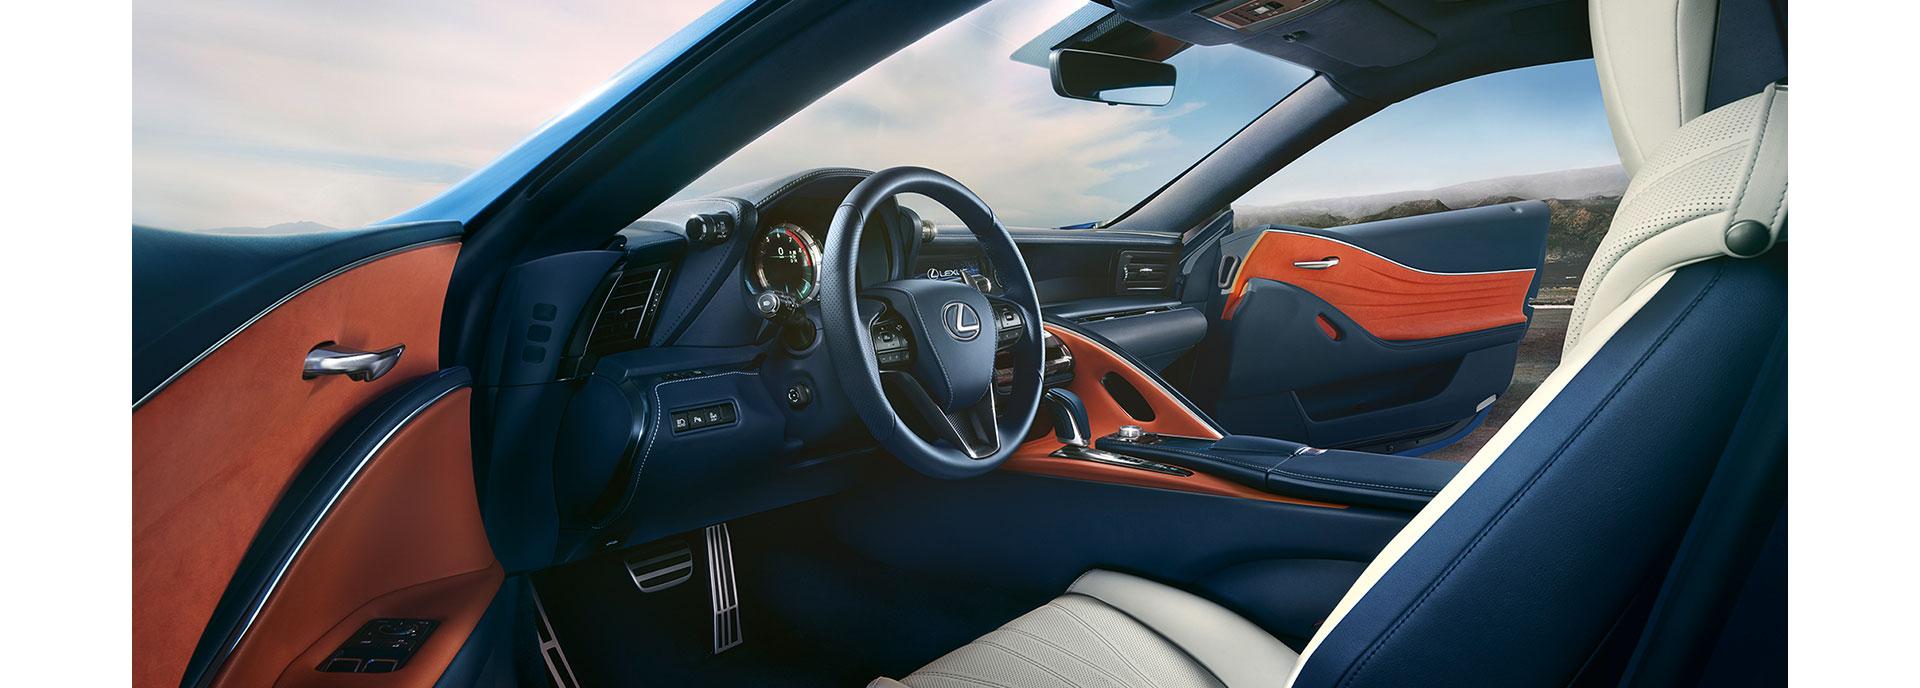 Lexus LC 500h Hybrid ohjaamo